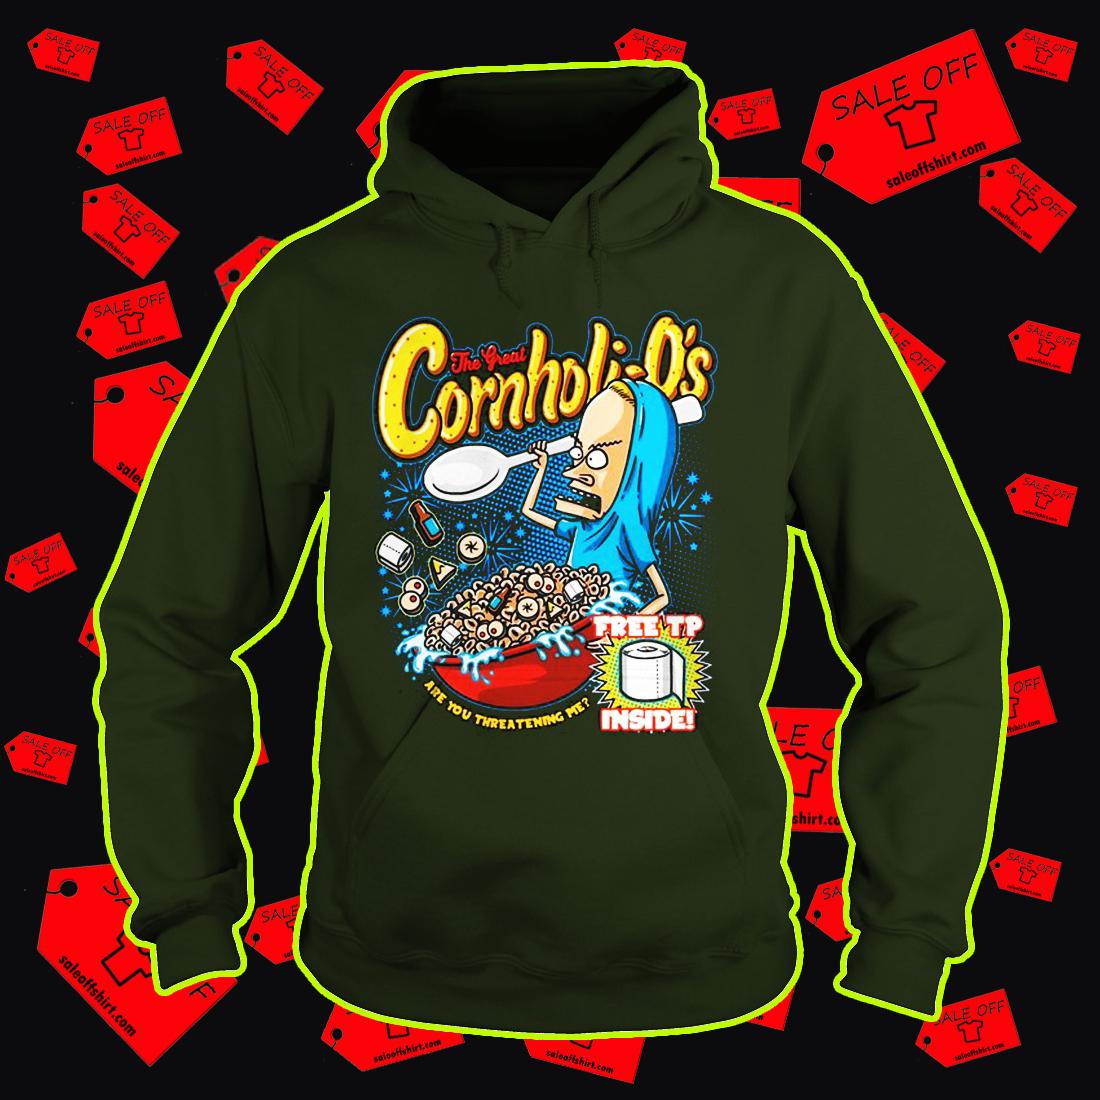 Beavis the great Cornholio free tp inside hoodie